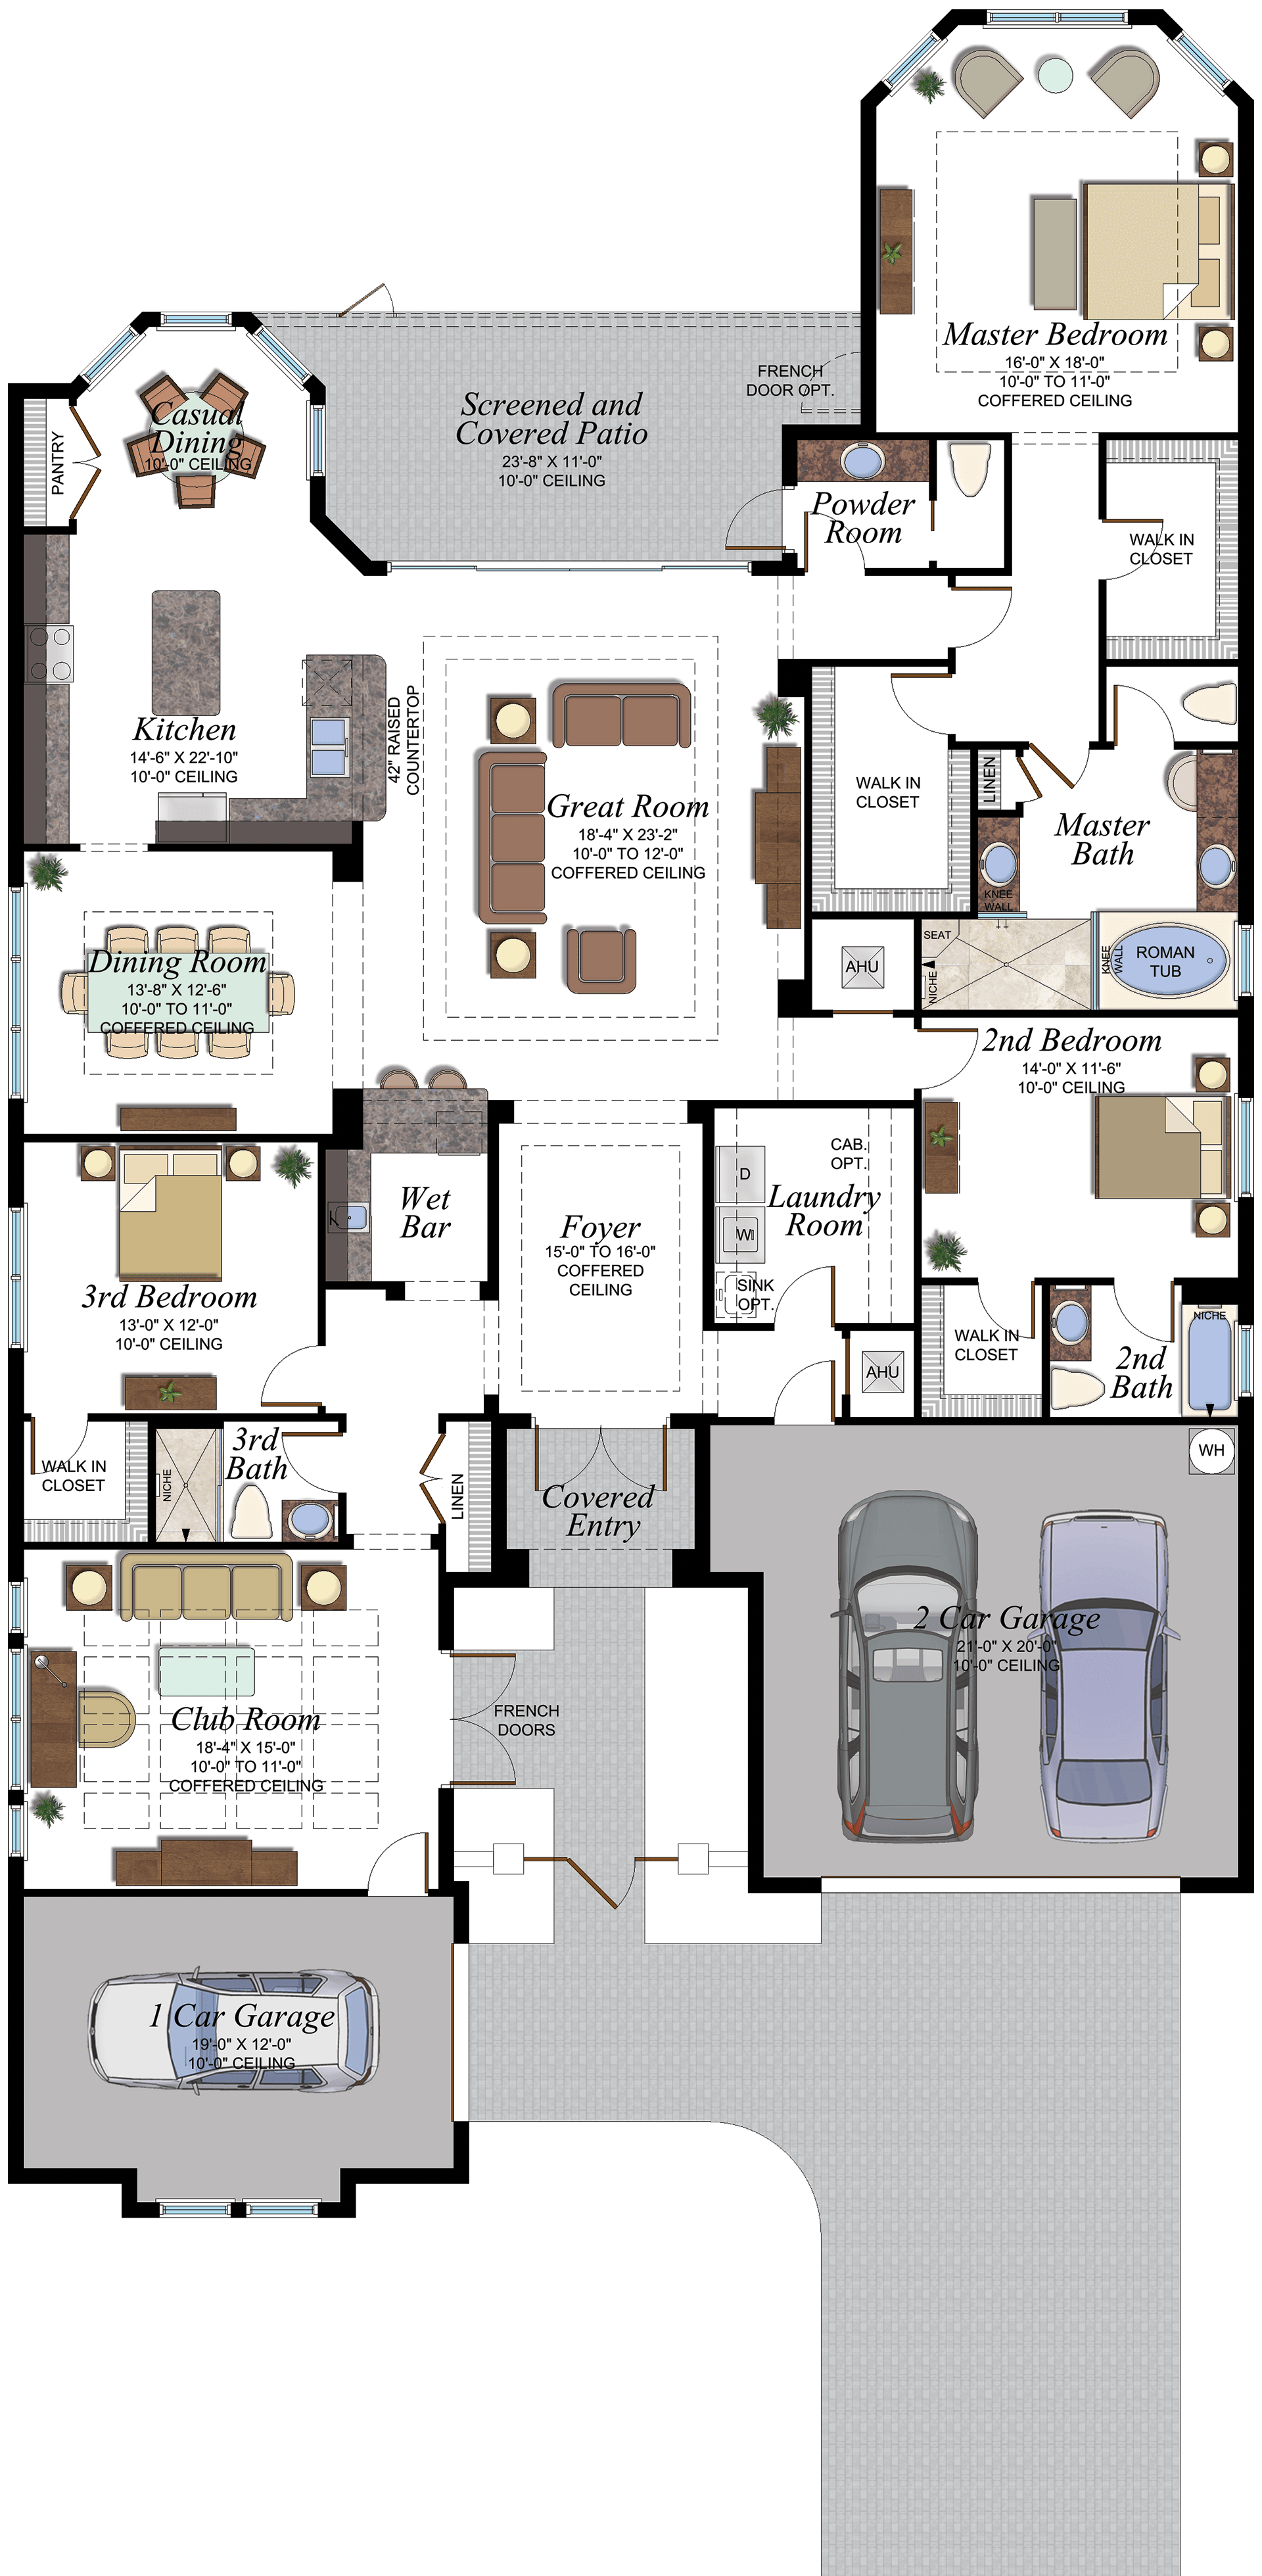 Carlyle Floorplan House Plans House Floor Plans Floor Plans